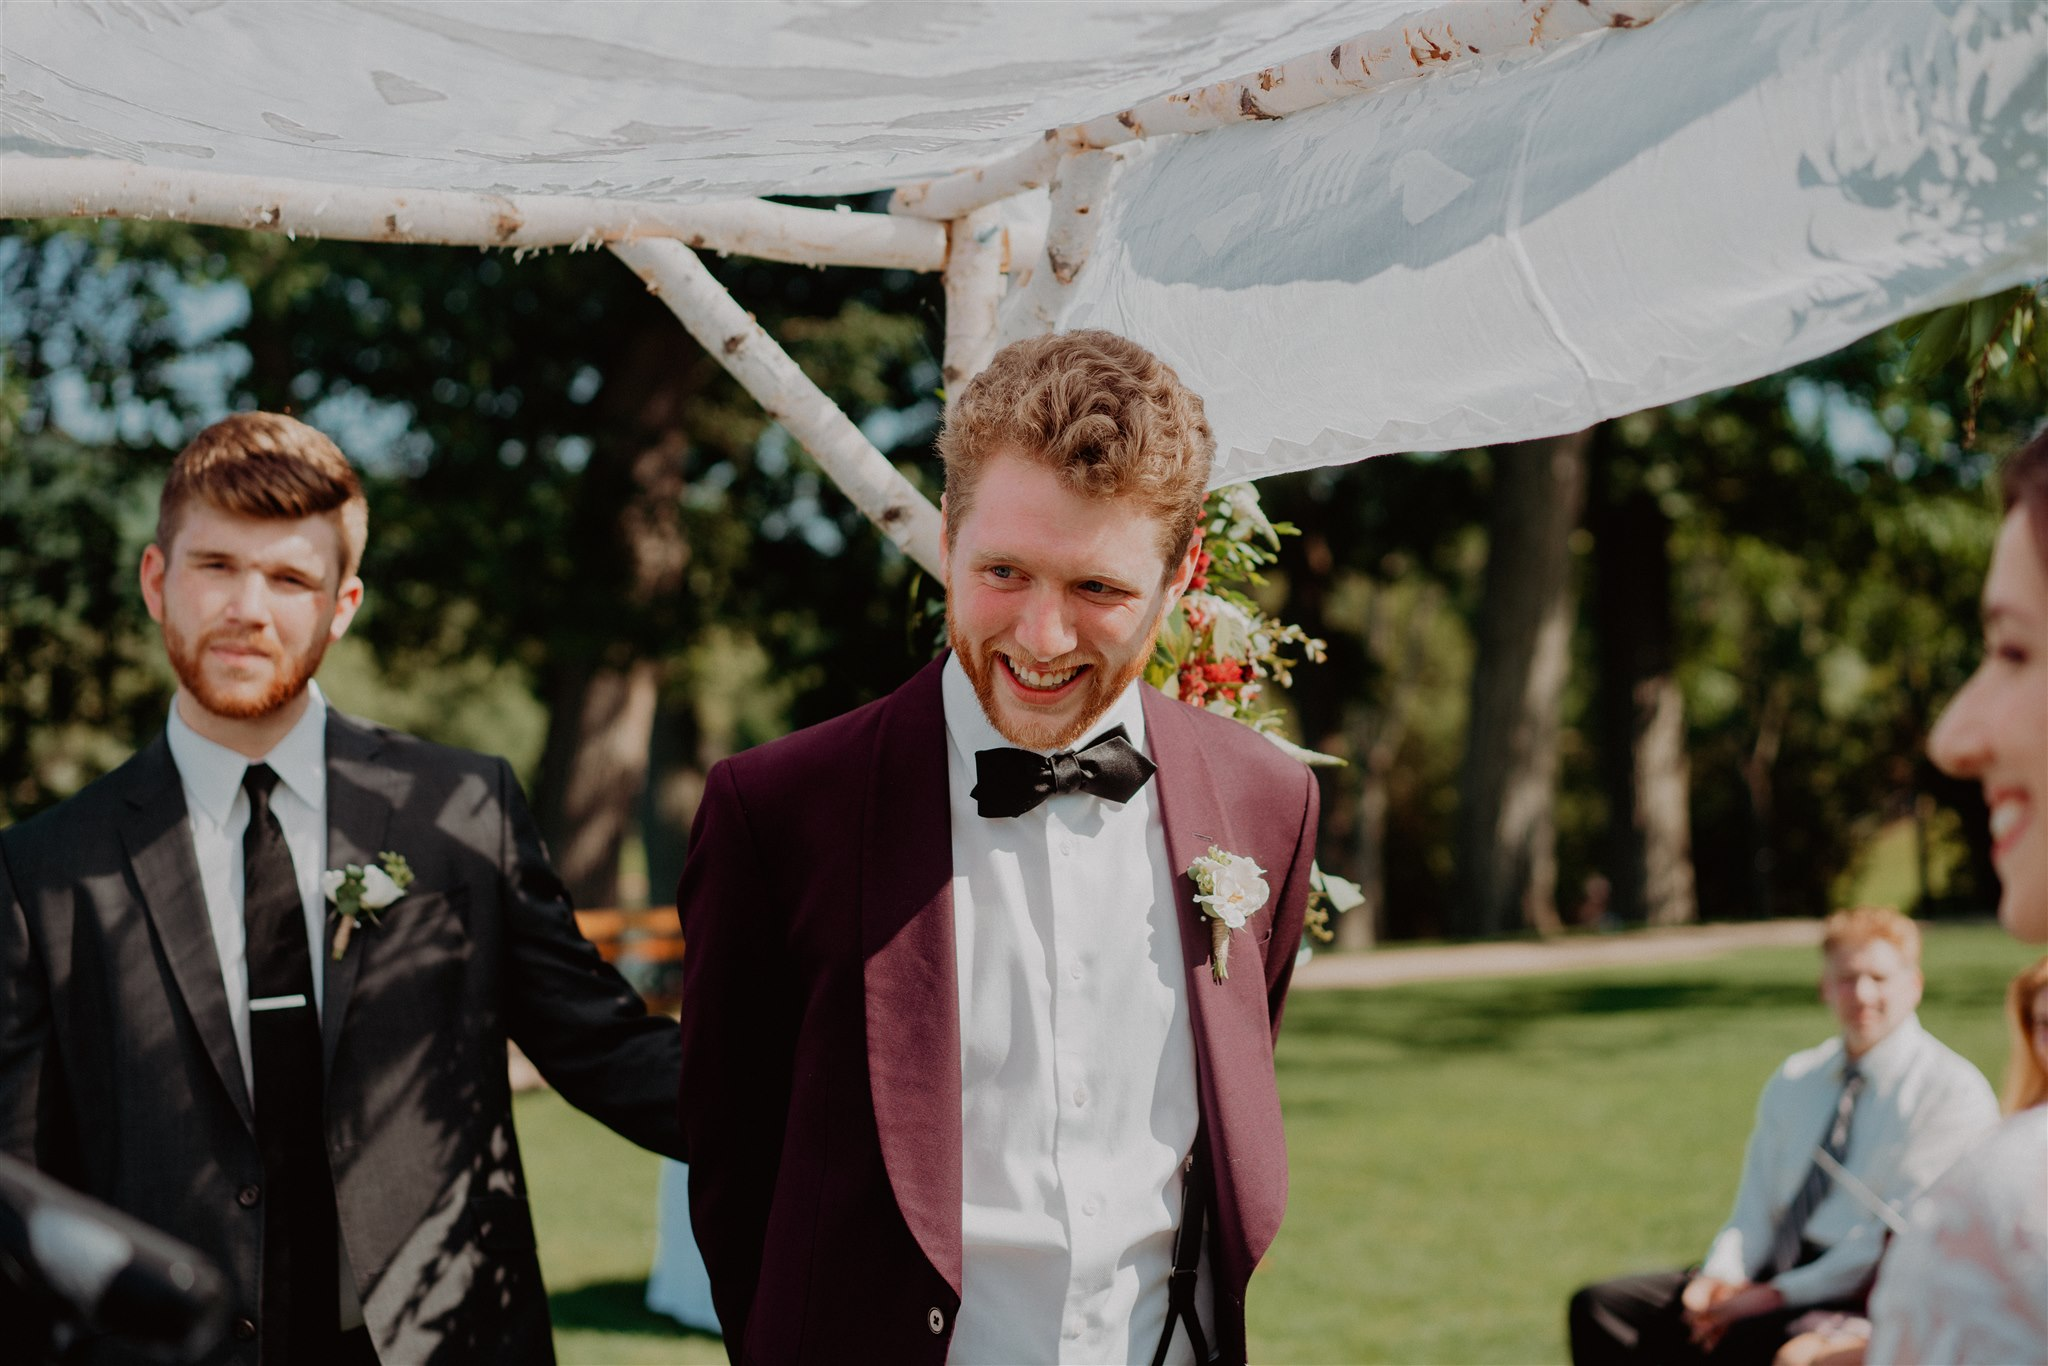 Chellise_Michael_Photography_Hudson_Valley_Wedding_Photographer_Otesaga_Hotel-3080.jpg